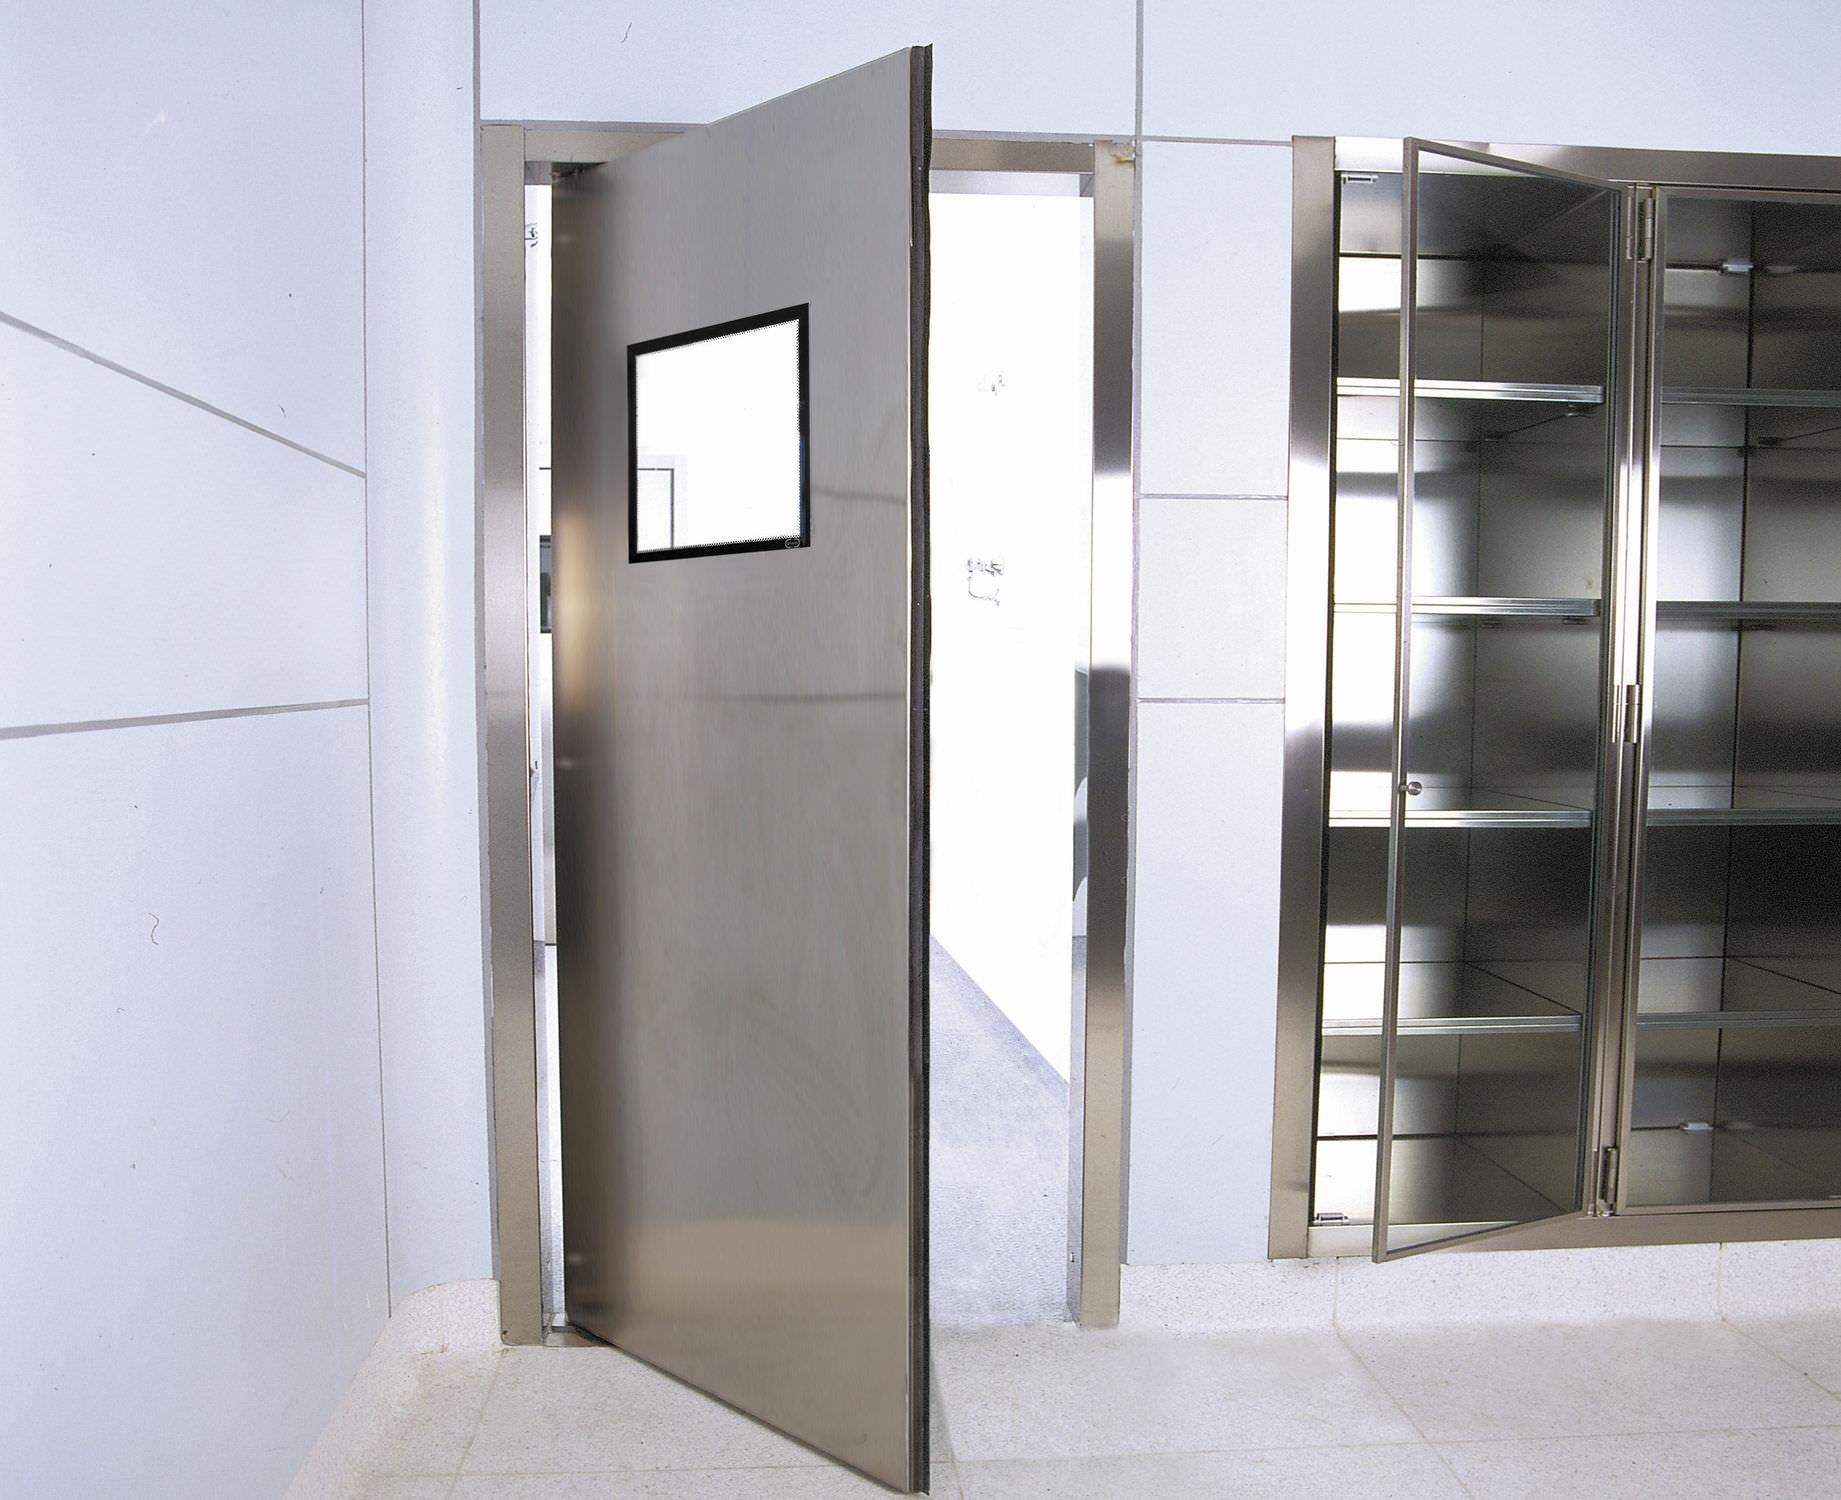 infissi acciaio inox mcd porte serramenti. Black Bedroom Furniture Sets. Home Design Ideas